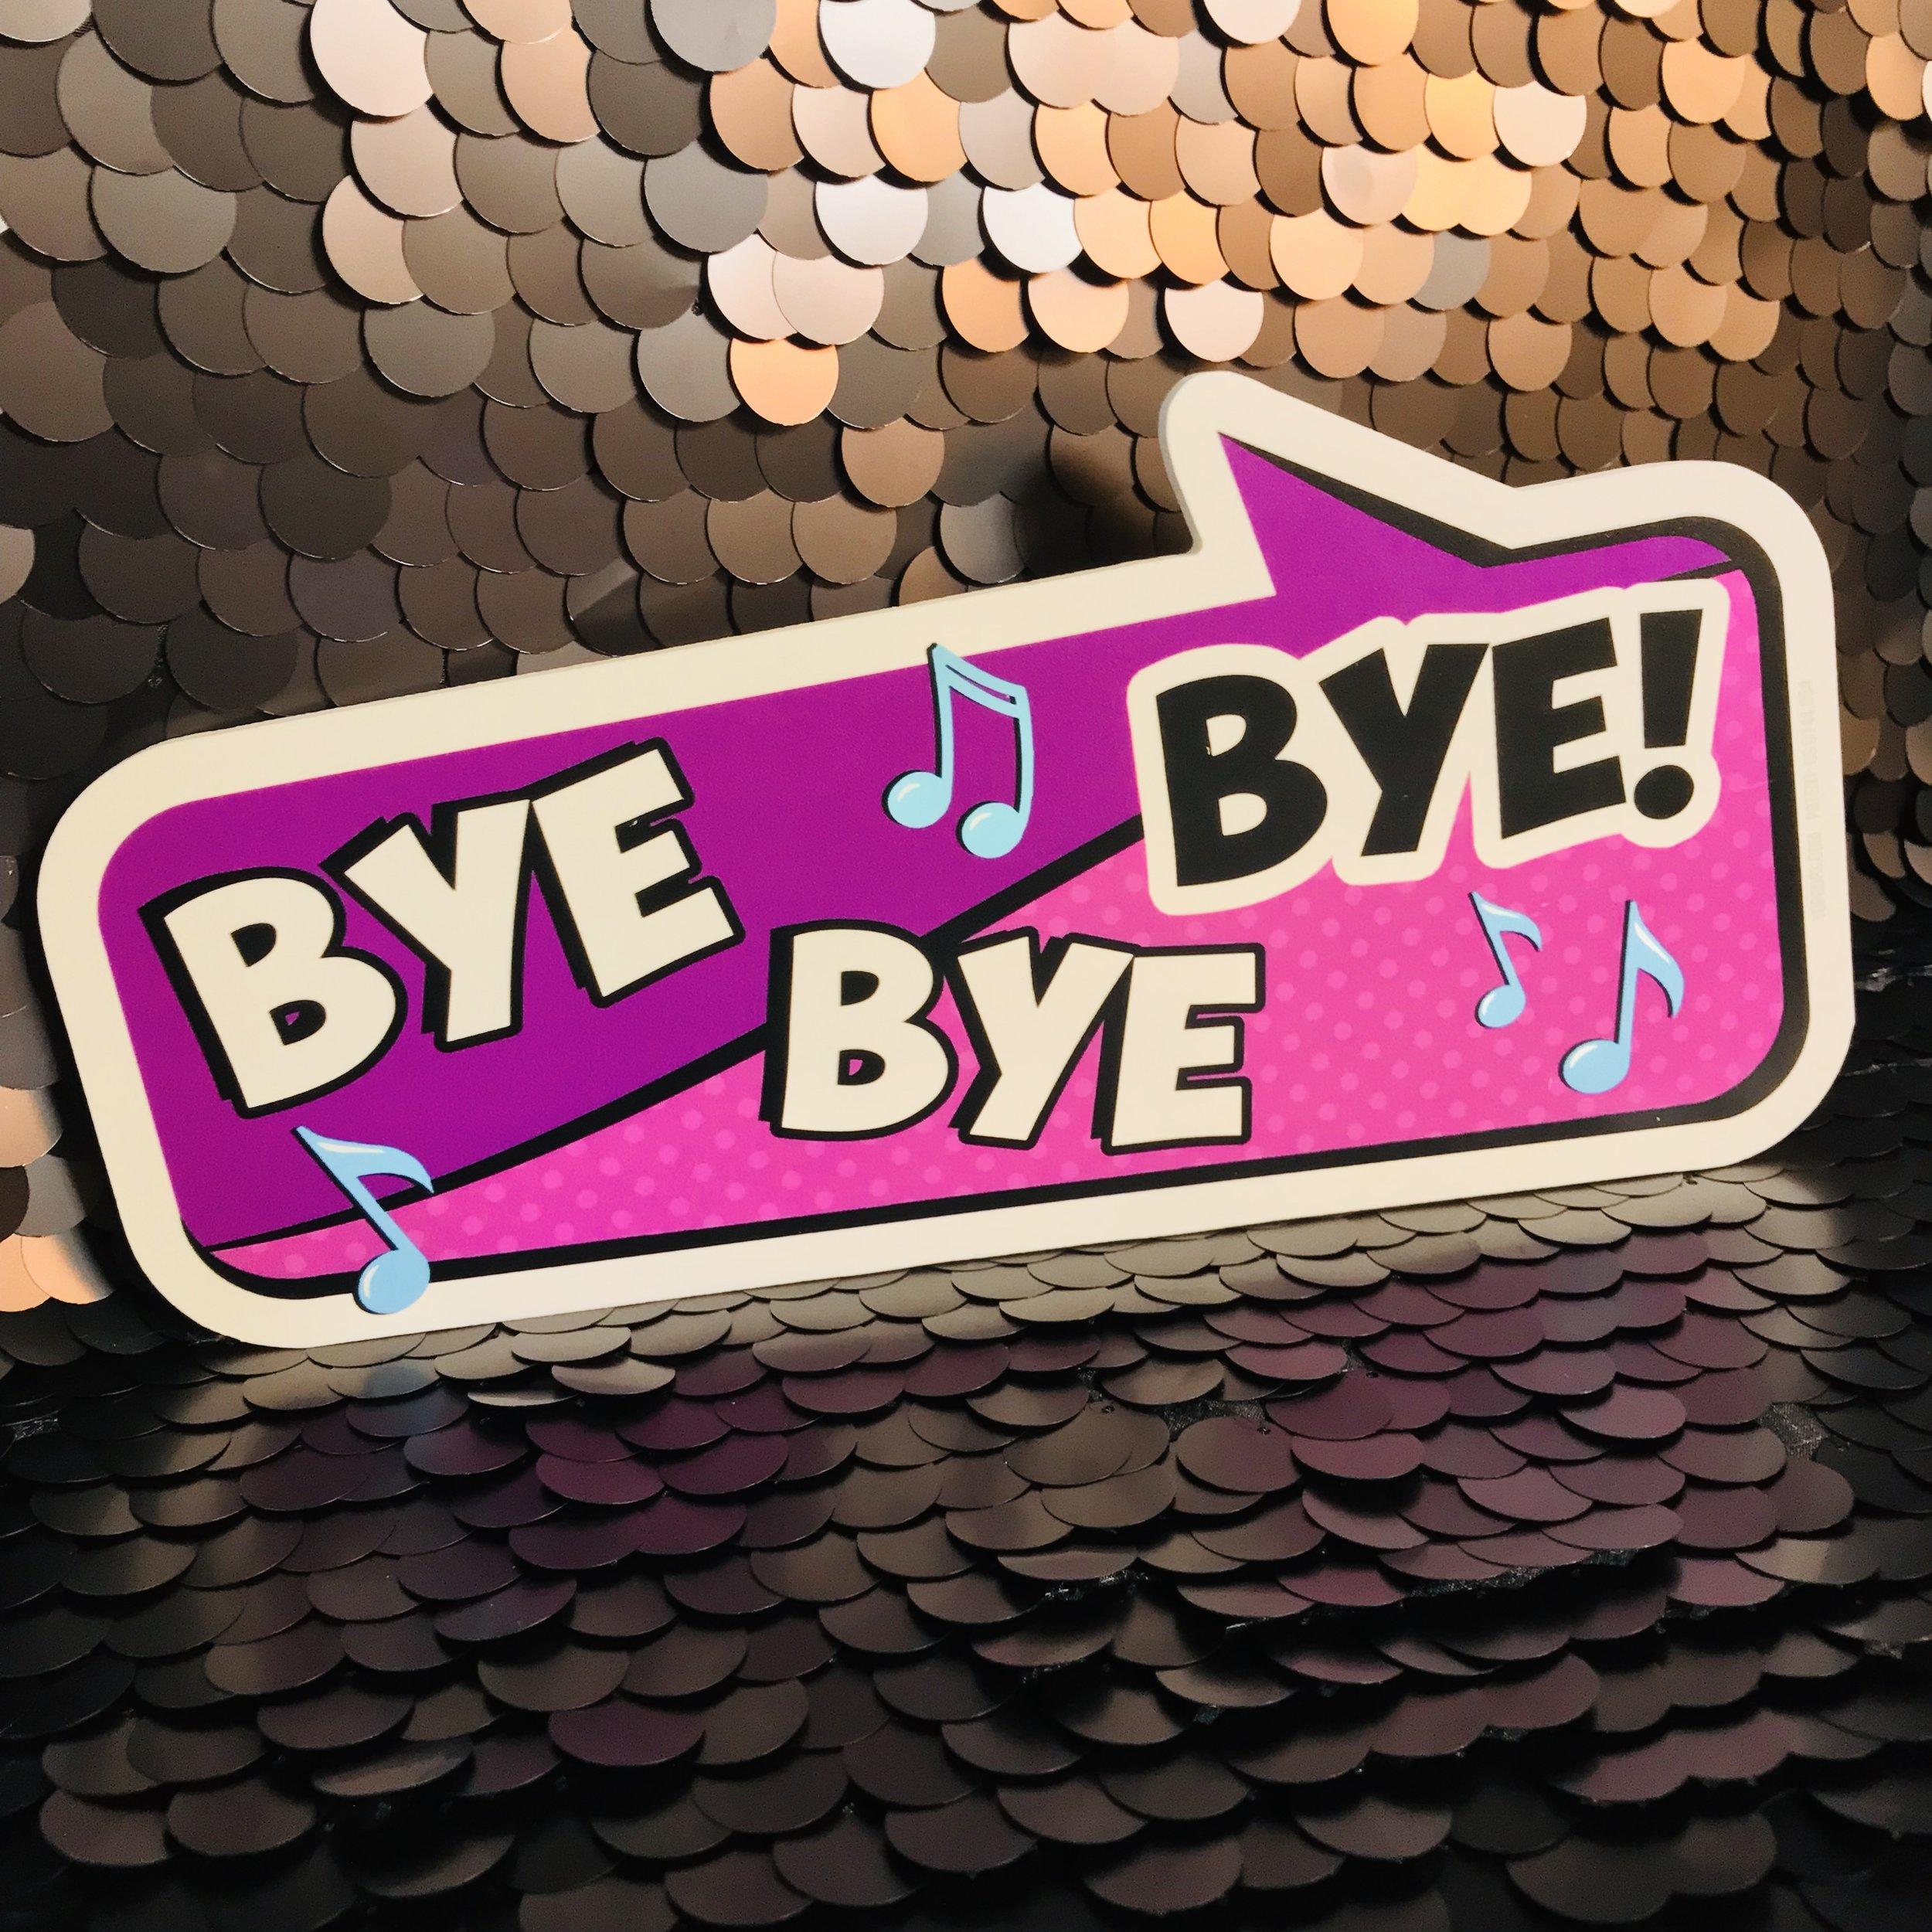 Bye bye bye.jpg